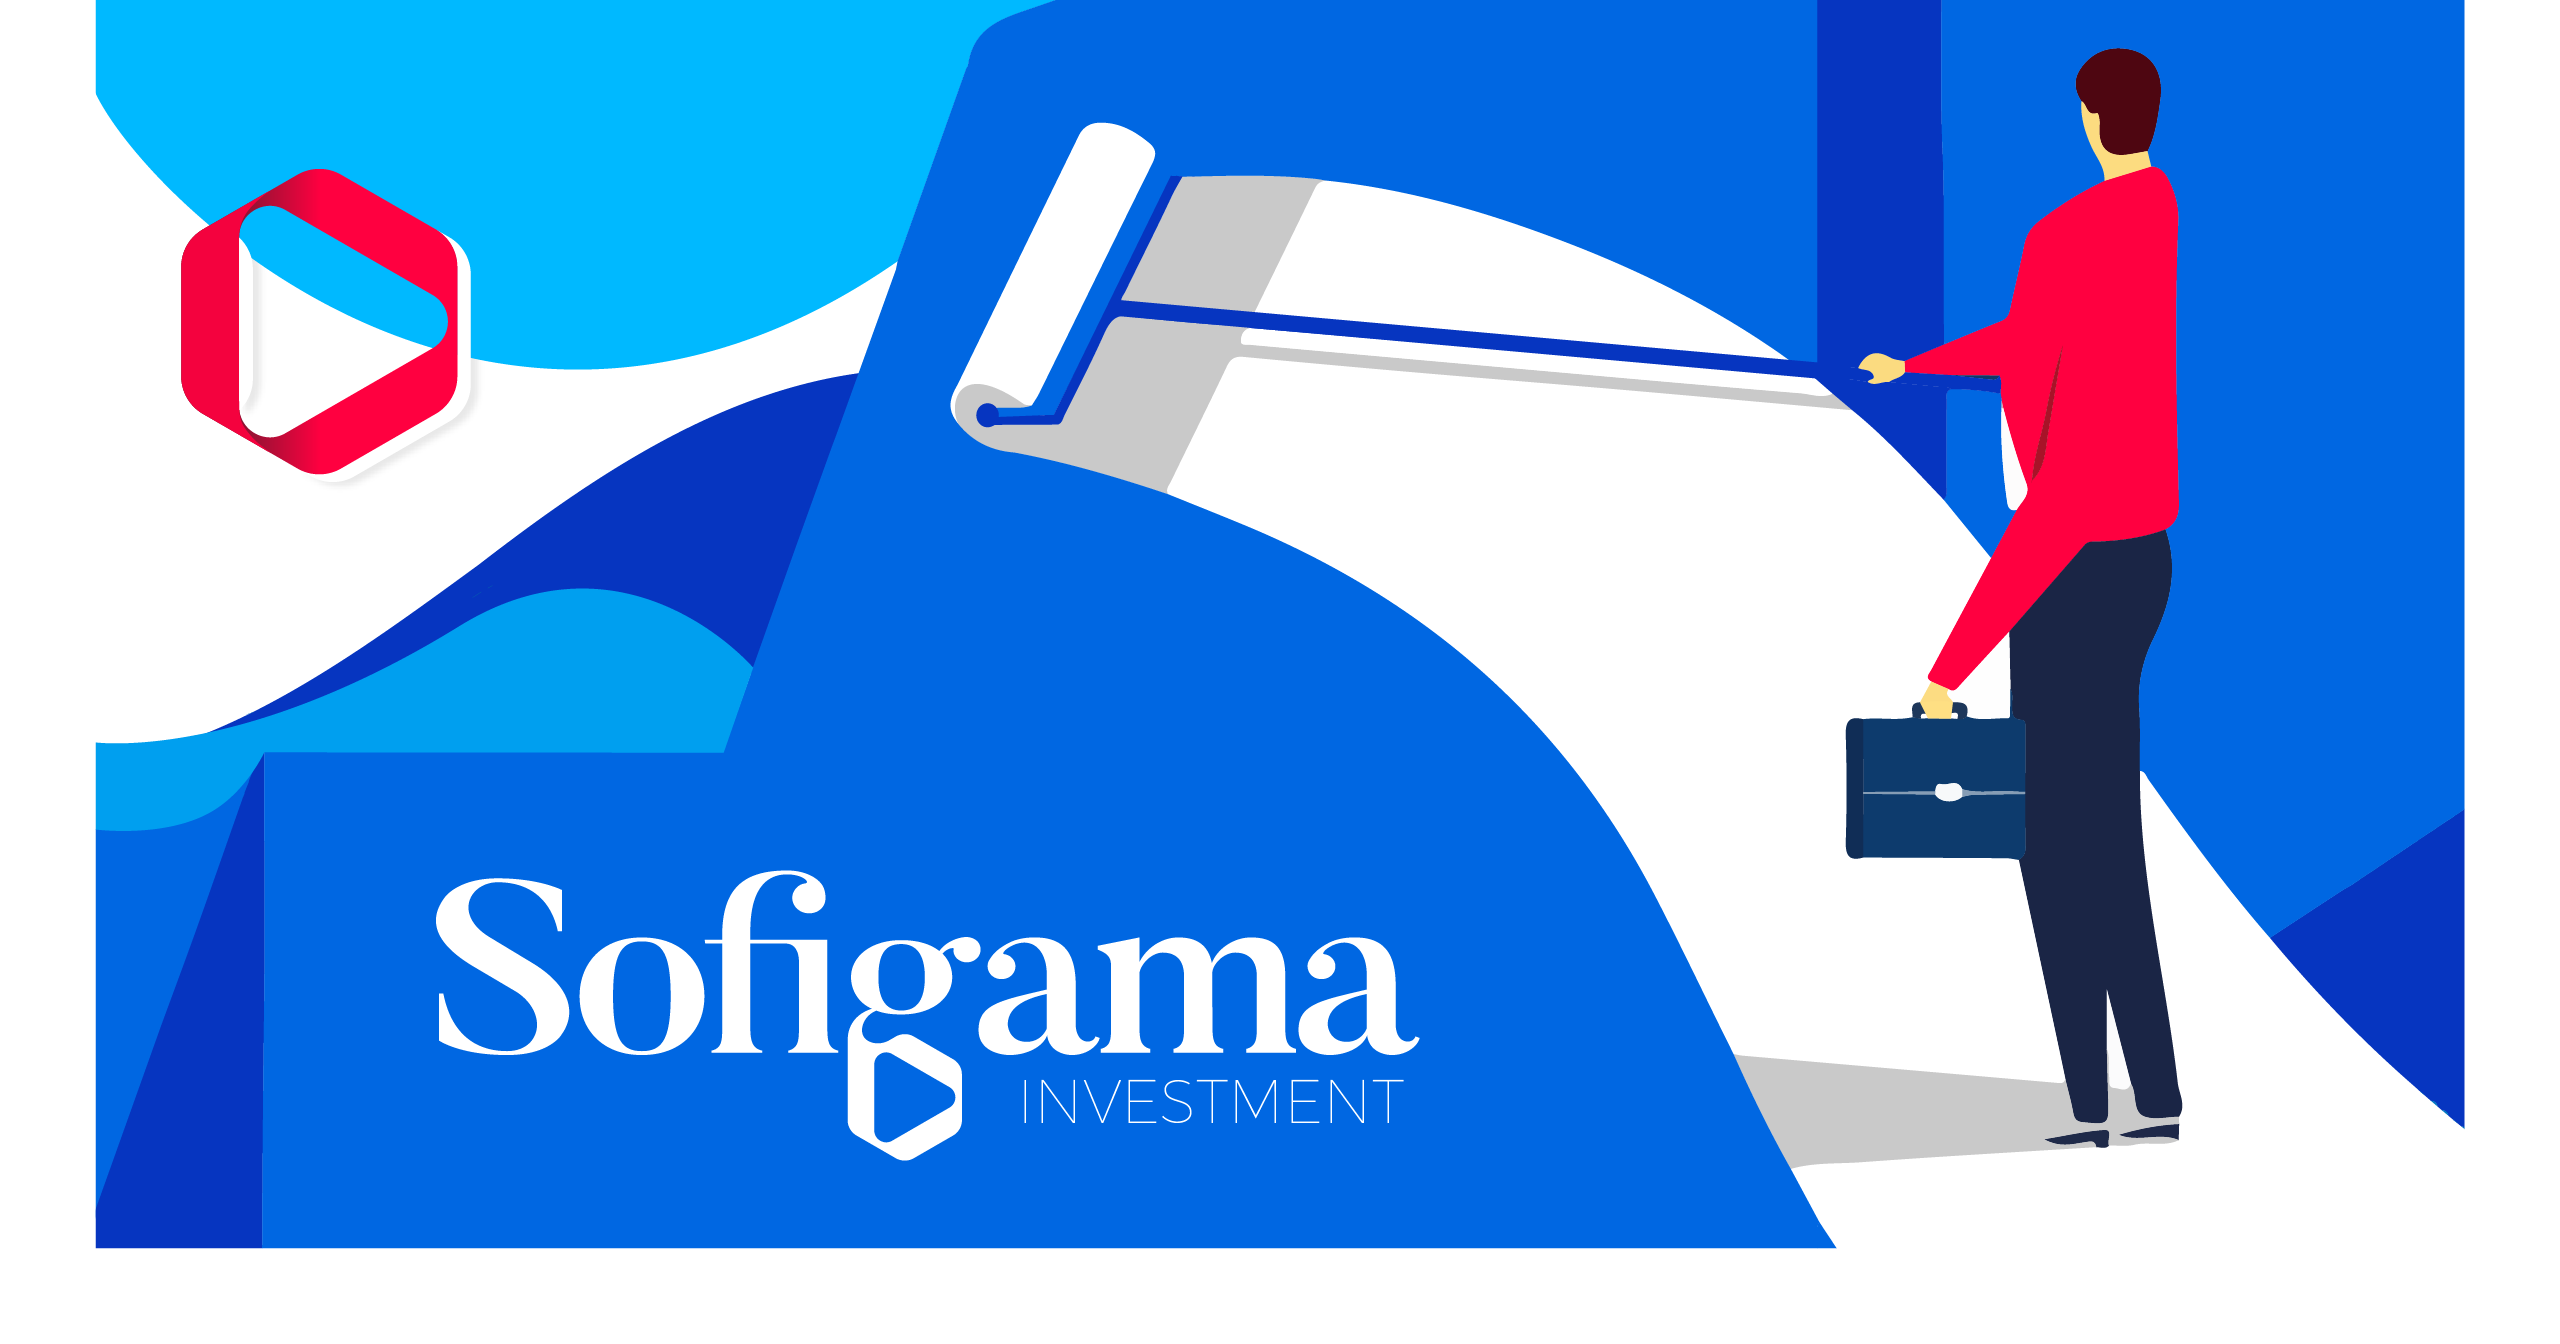 SOFIGAMA Logo Logobou Design 2